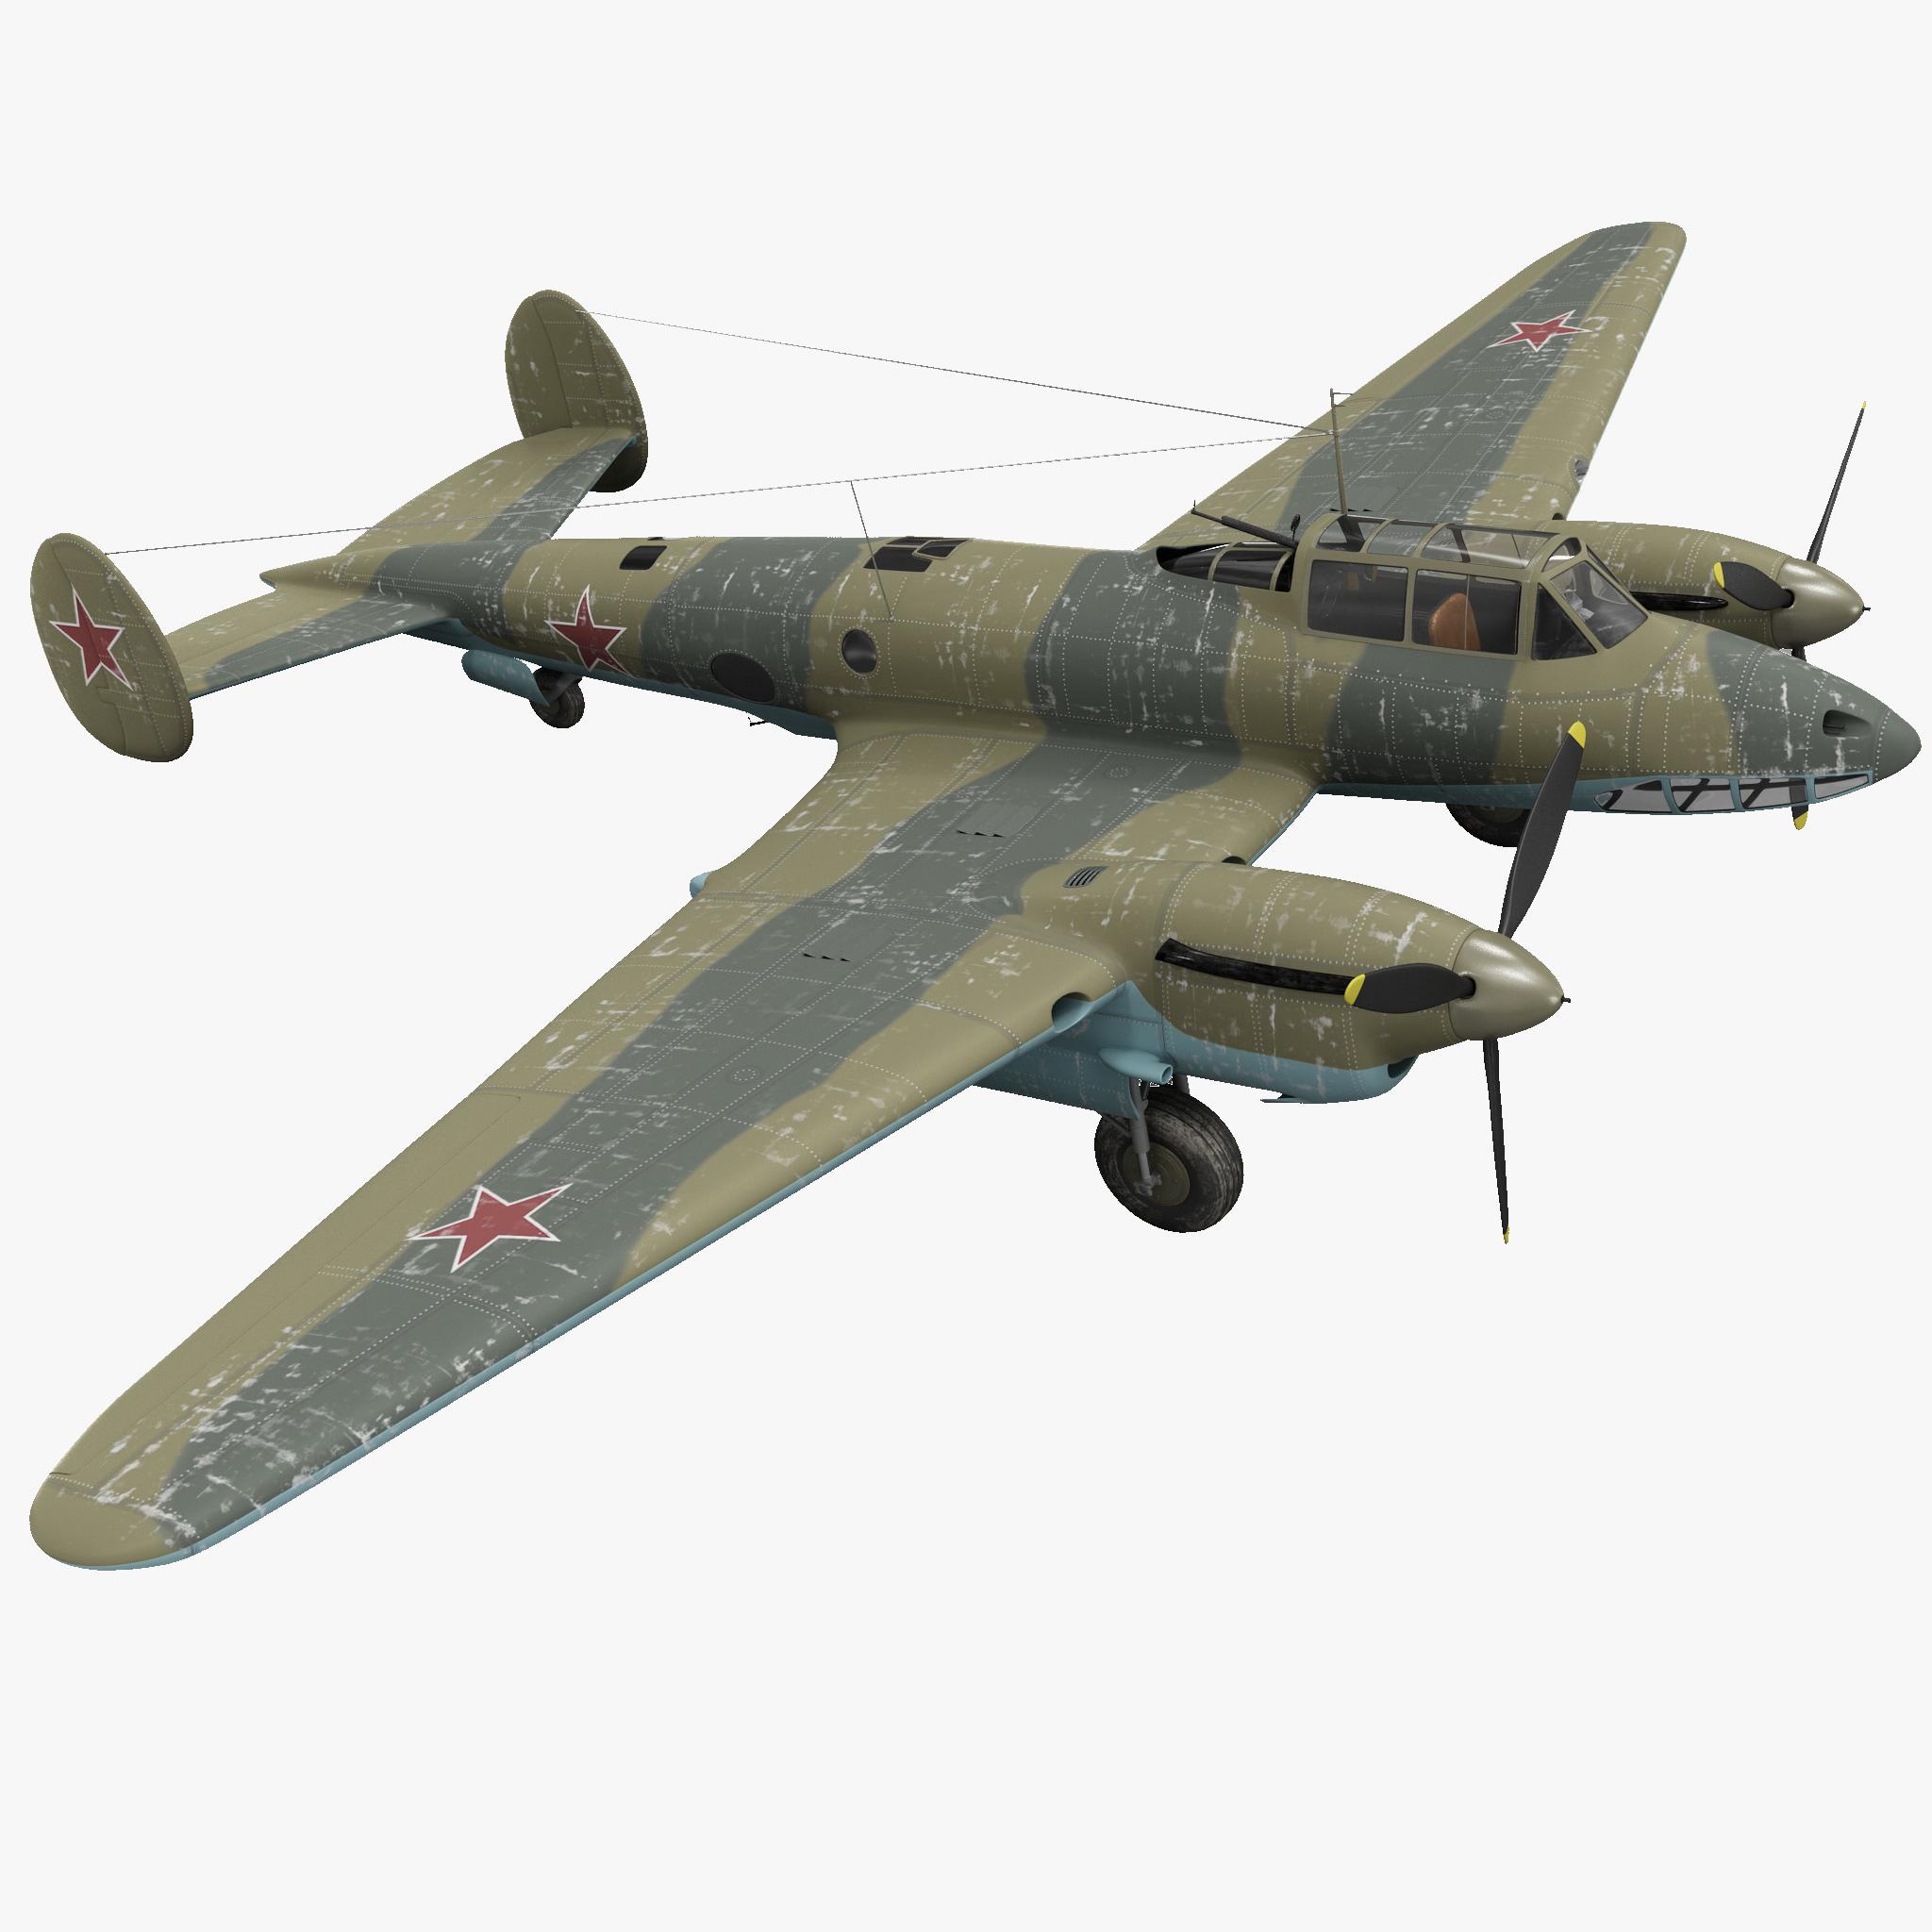 Petlyakov Pe-2I Russian World War II Bomber_267.jpg